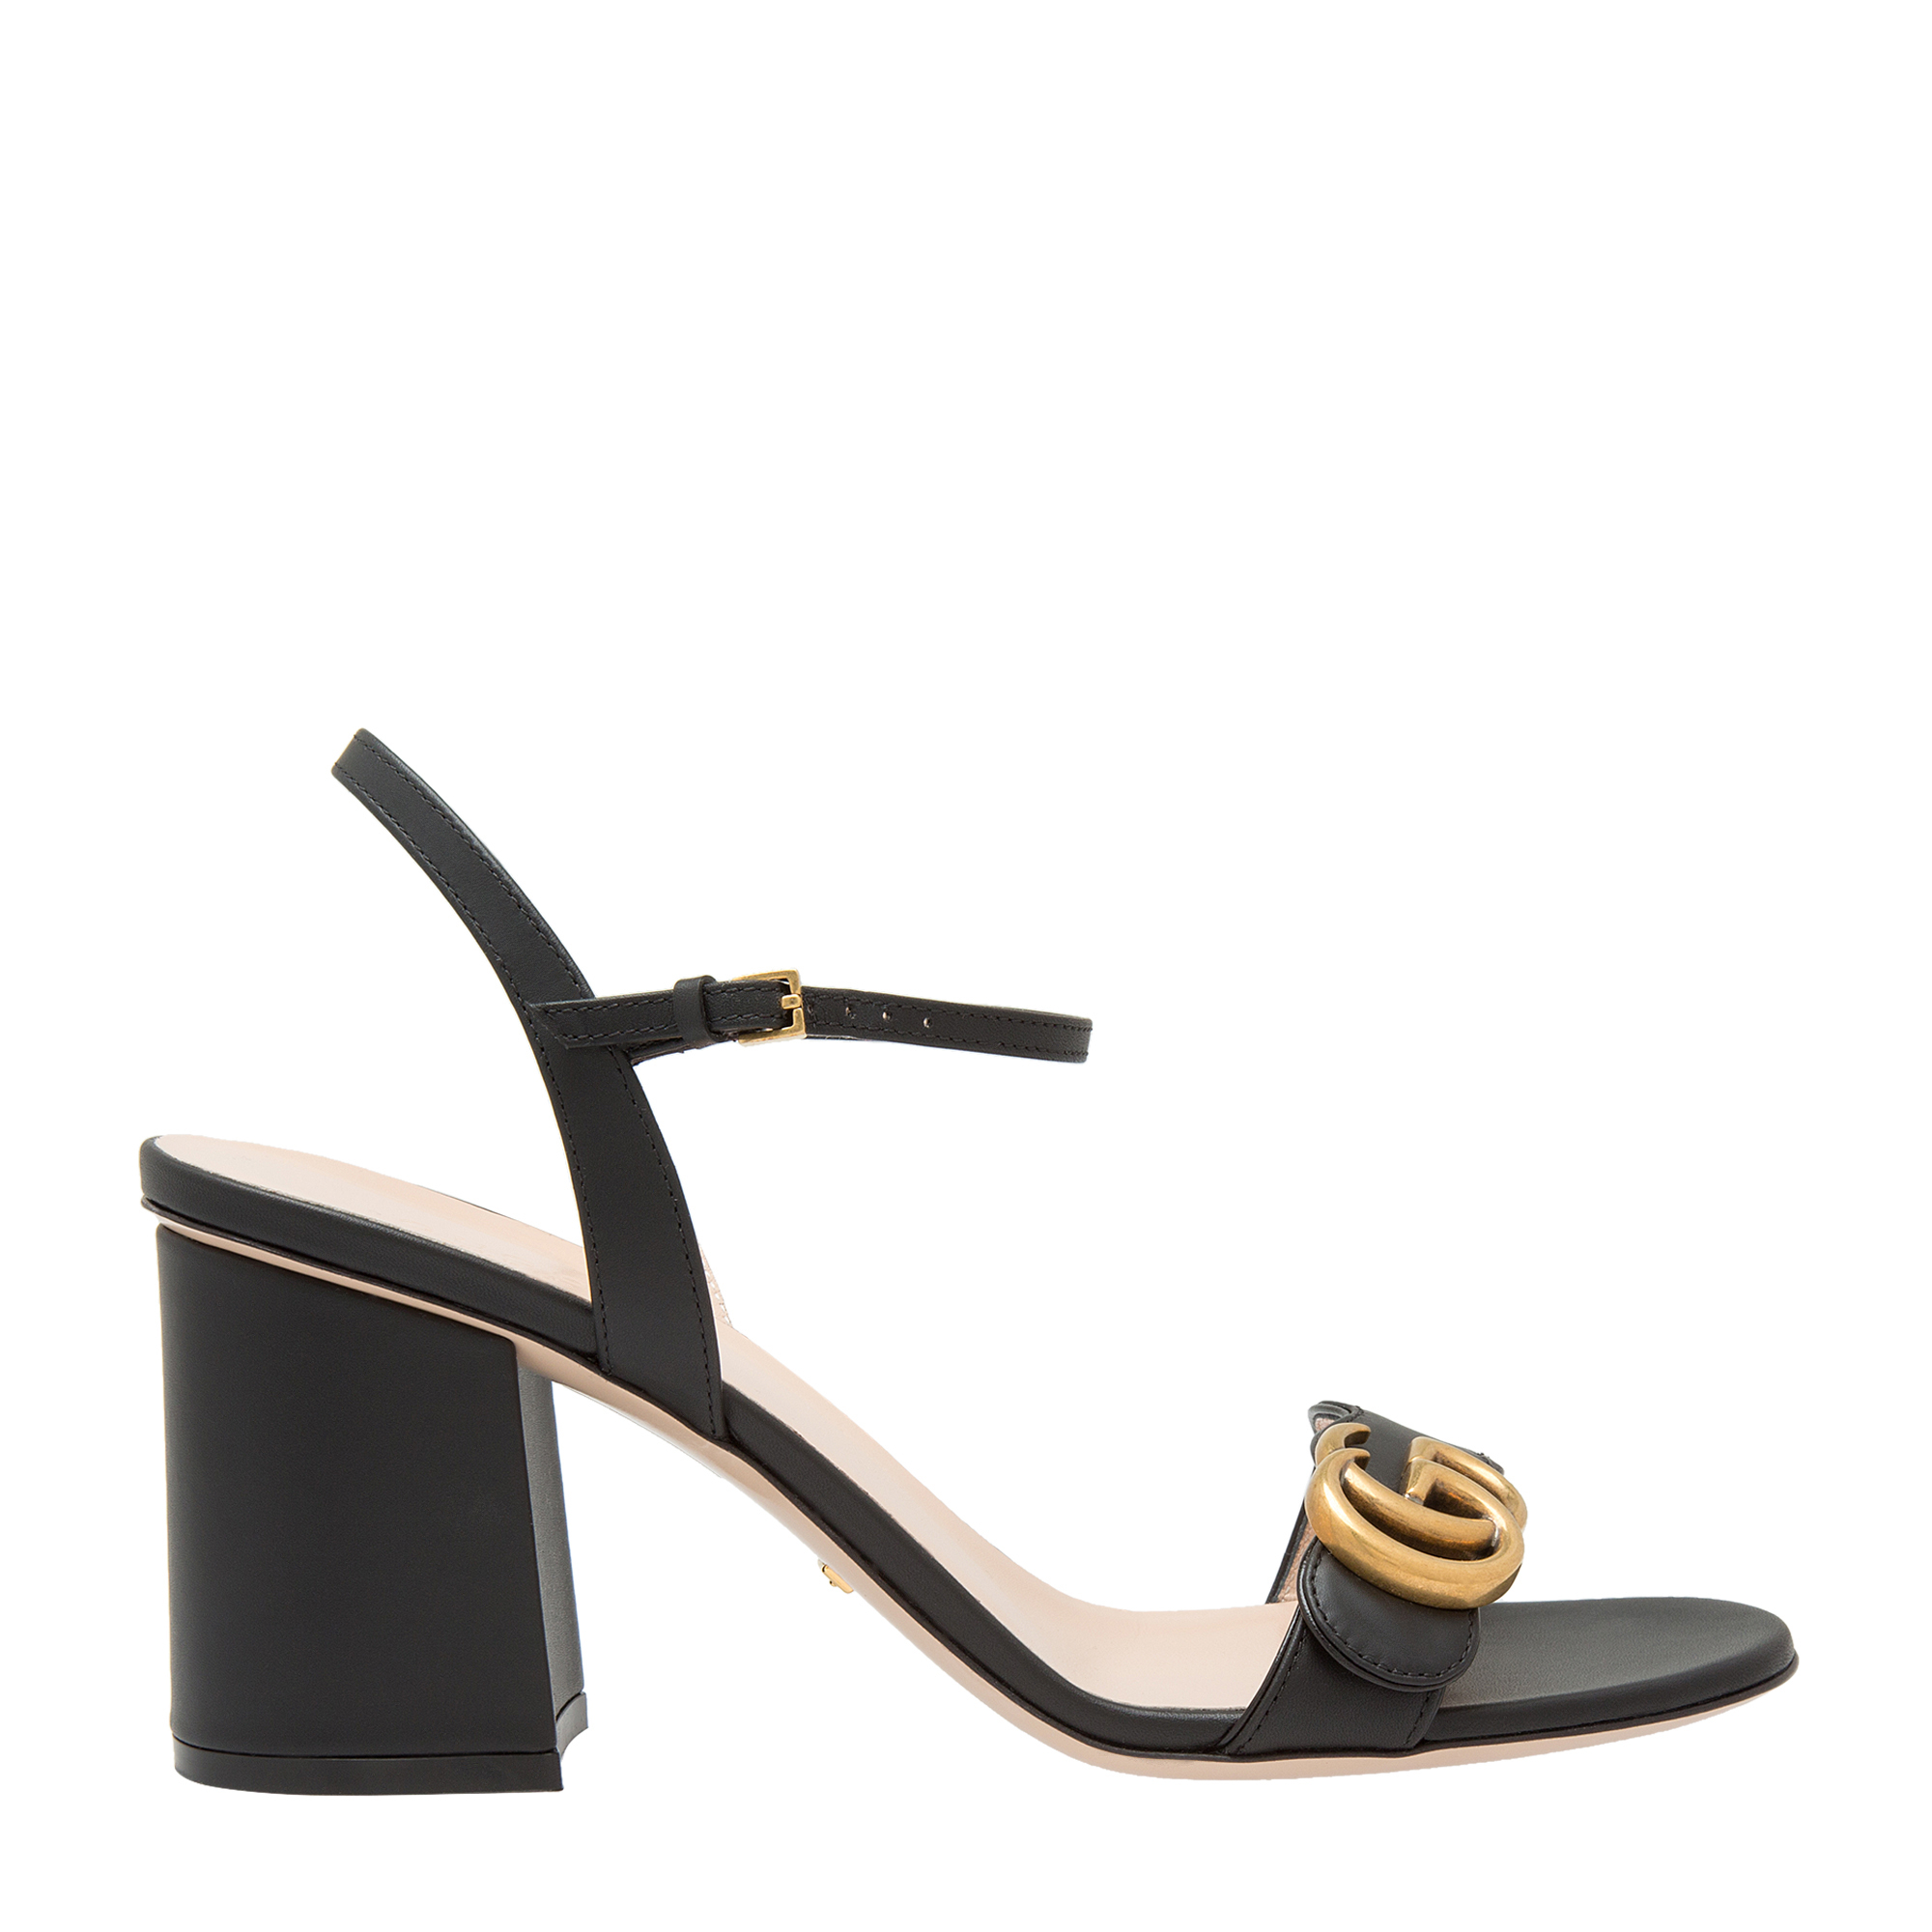 Marmont sandals